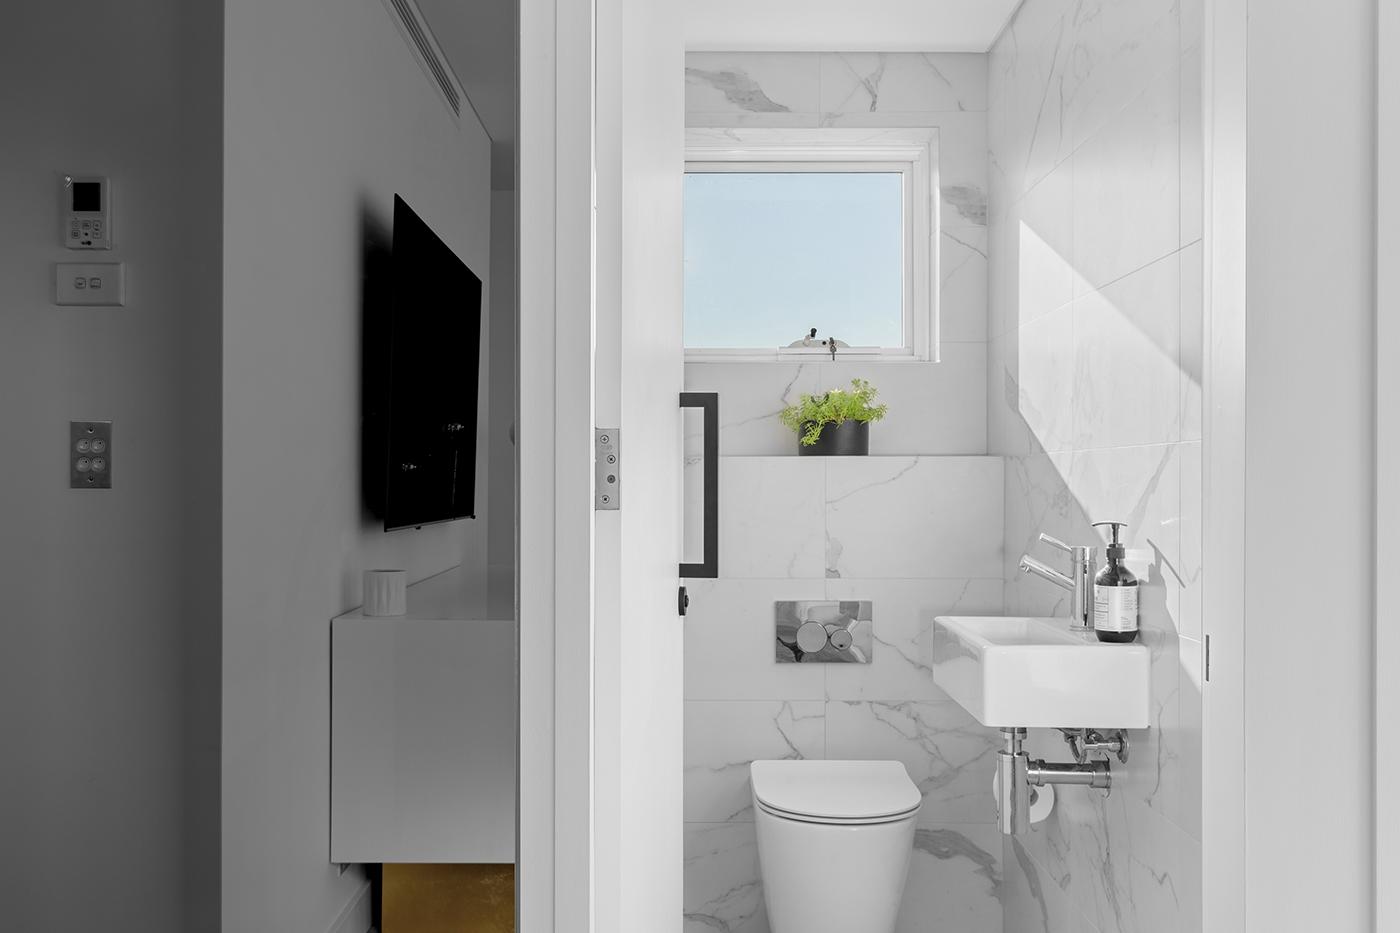 A toilet room renovation